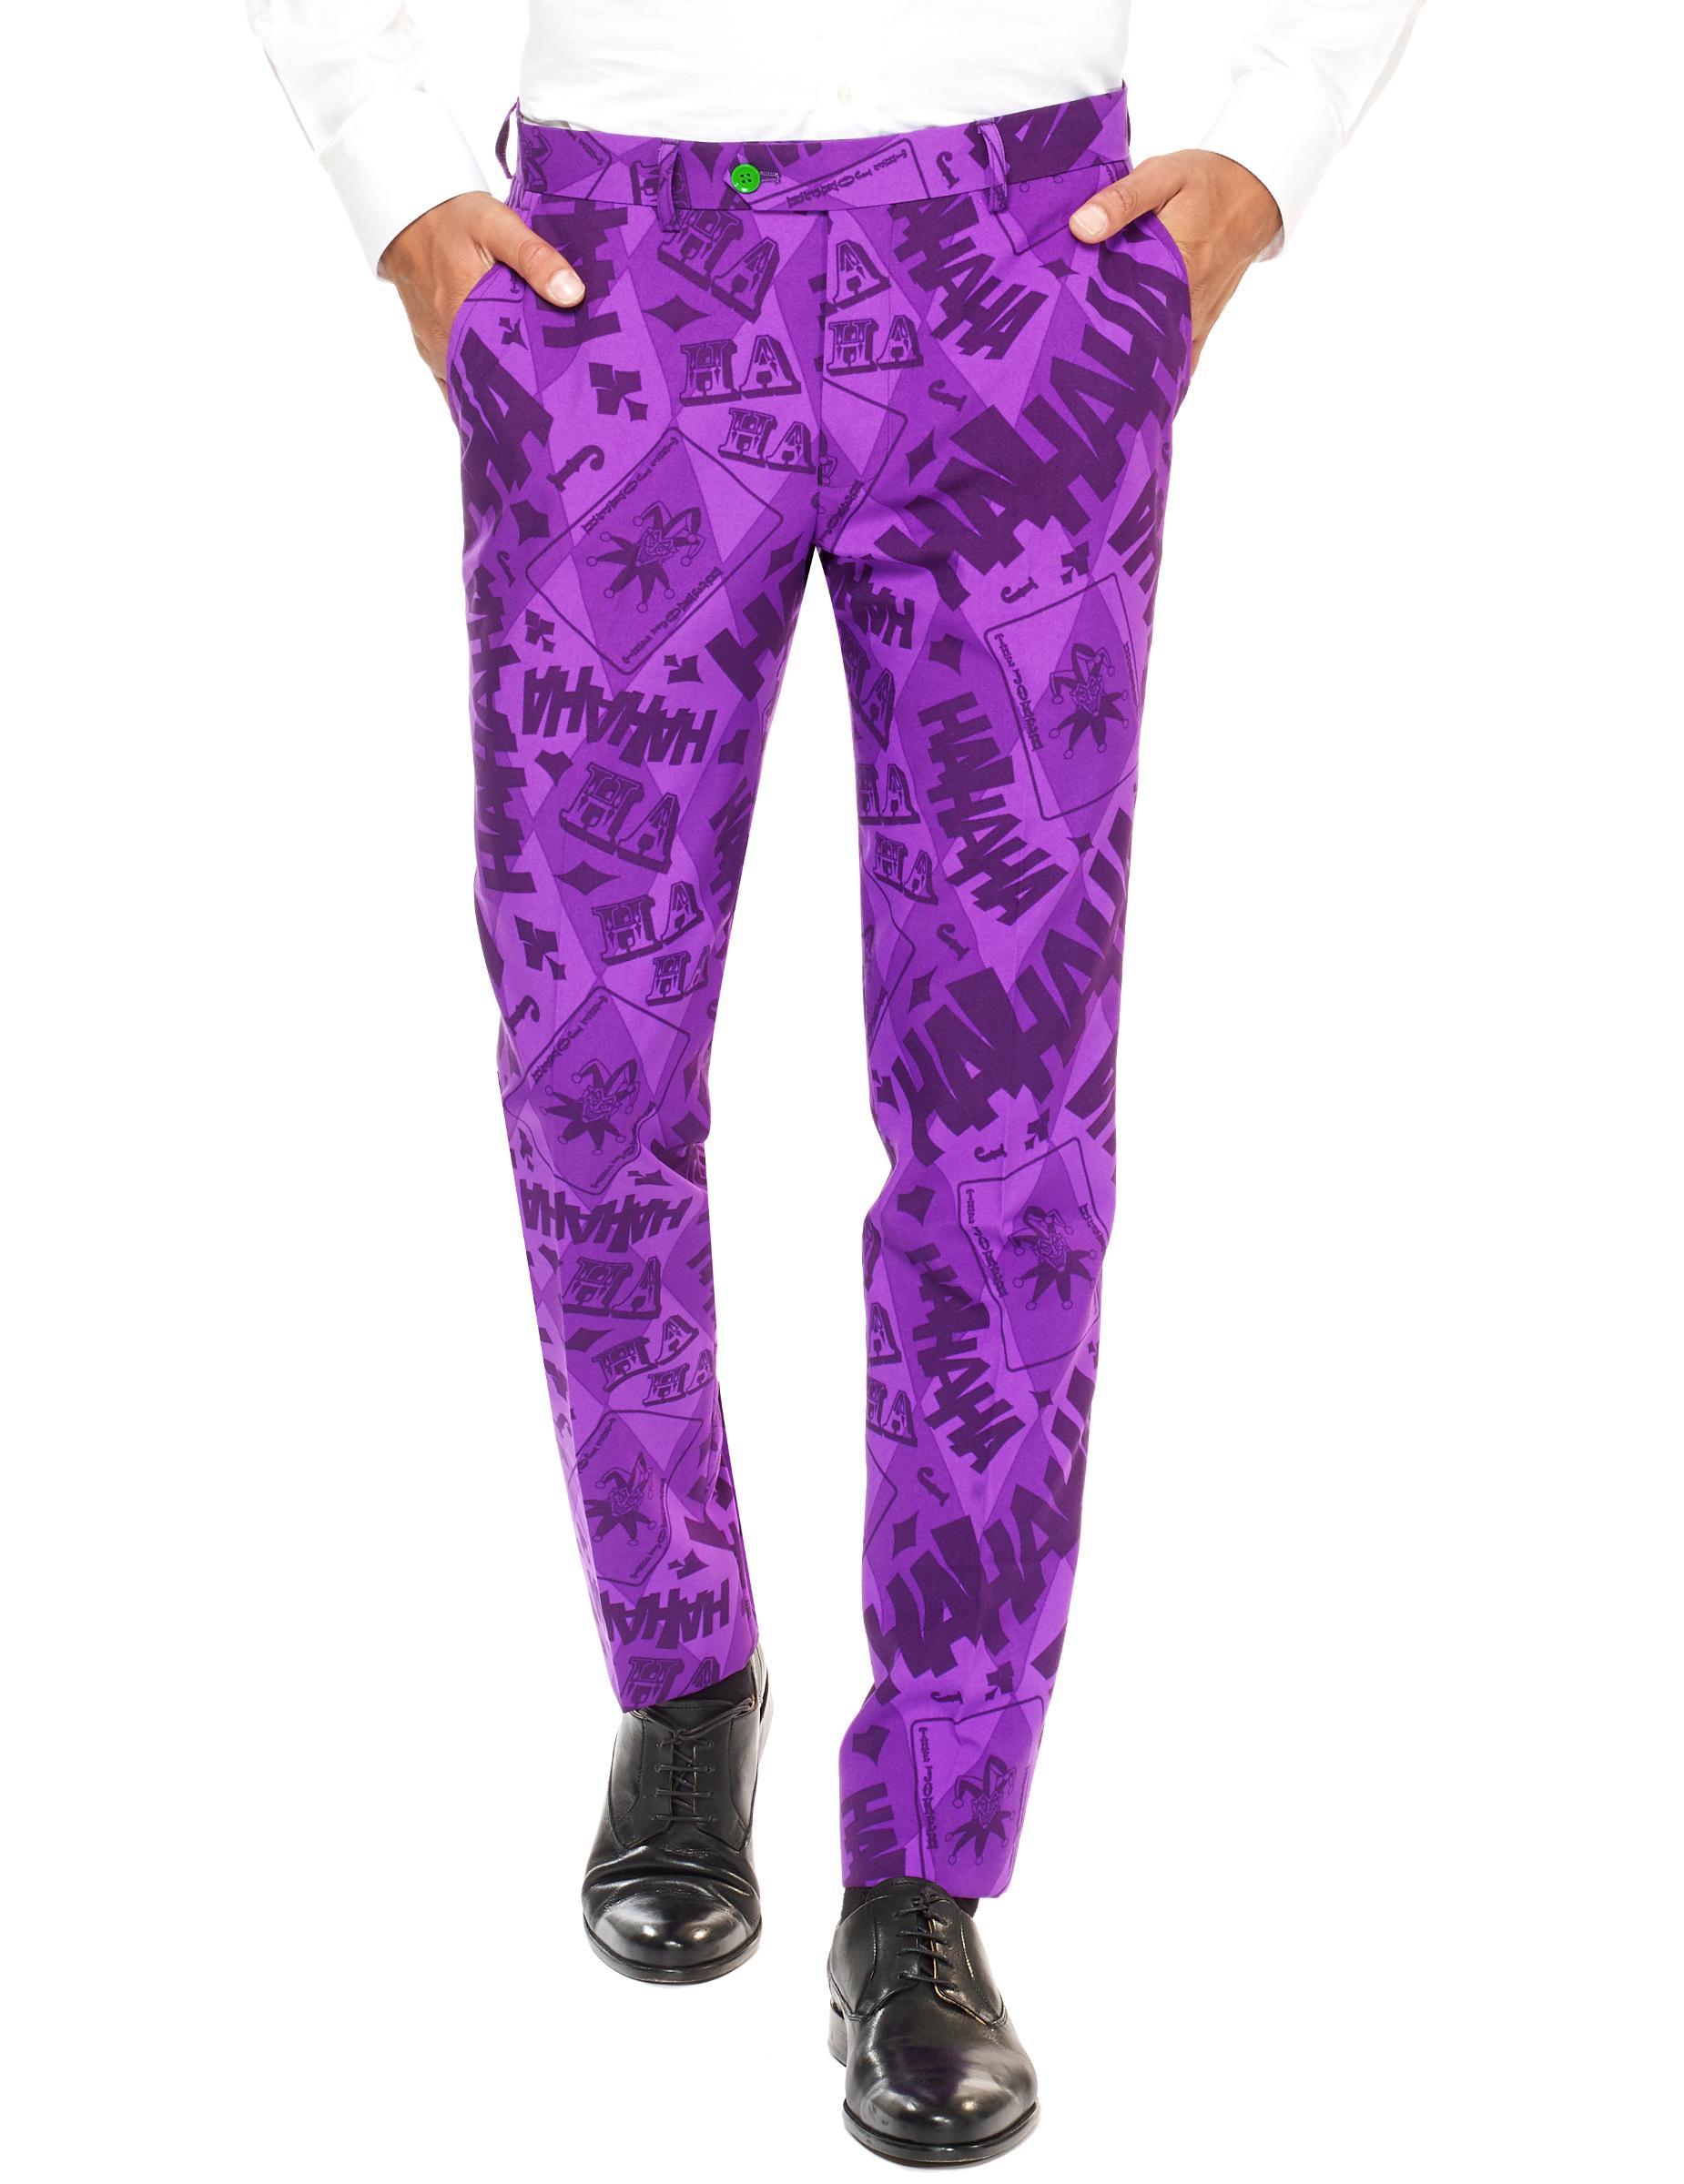 Mr Joker Anzug Opposuits Herrenanzug Lila